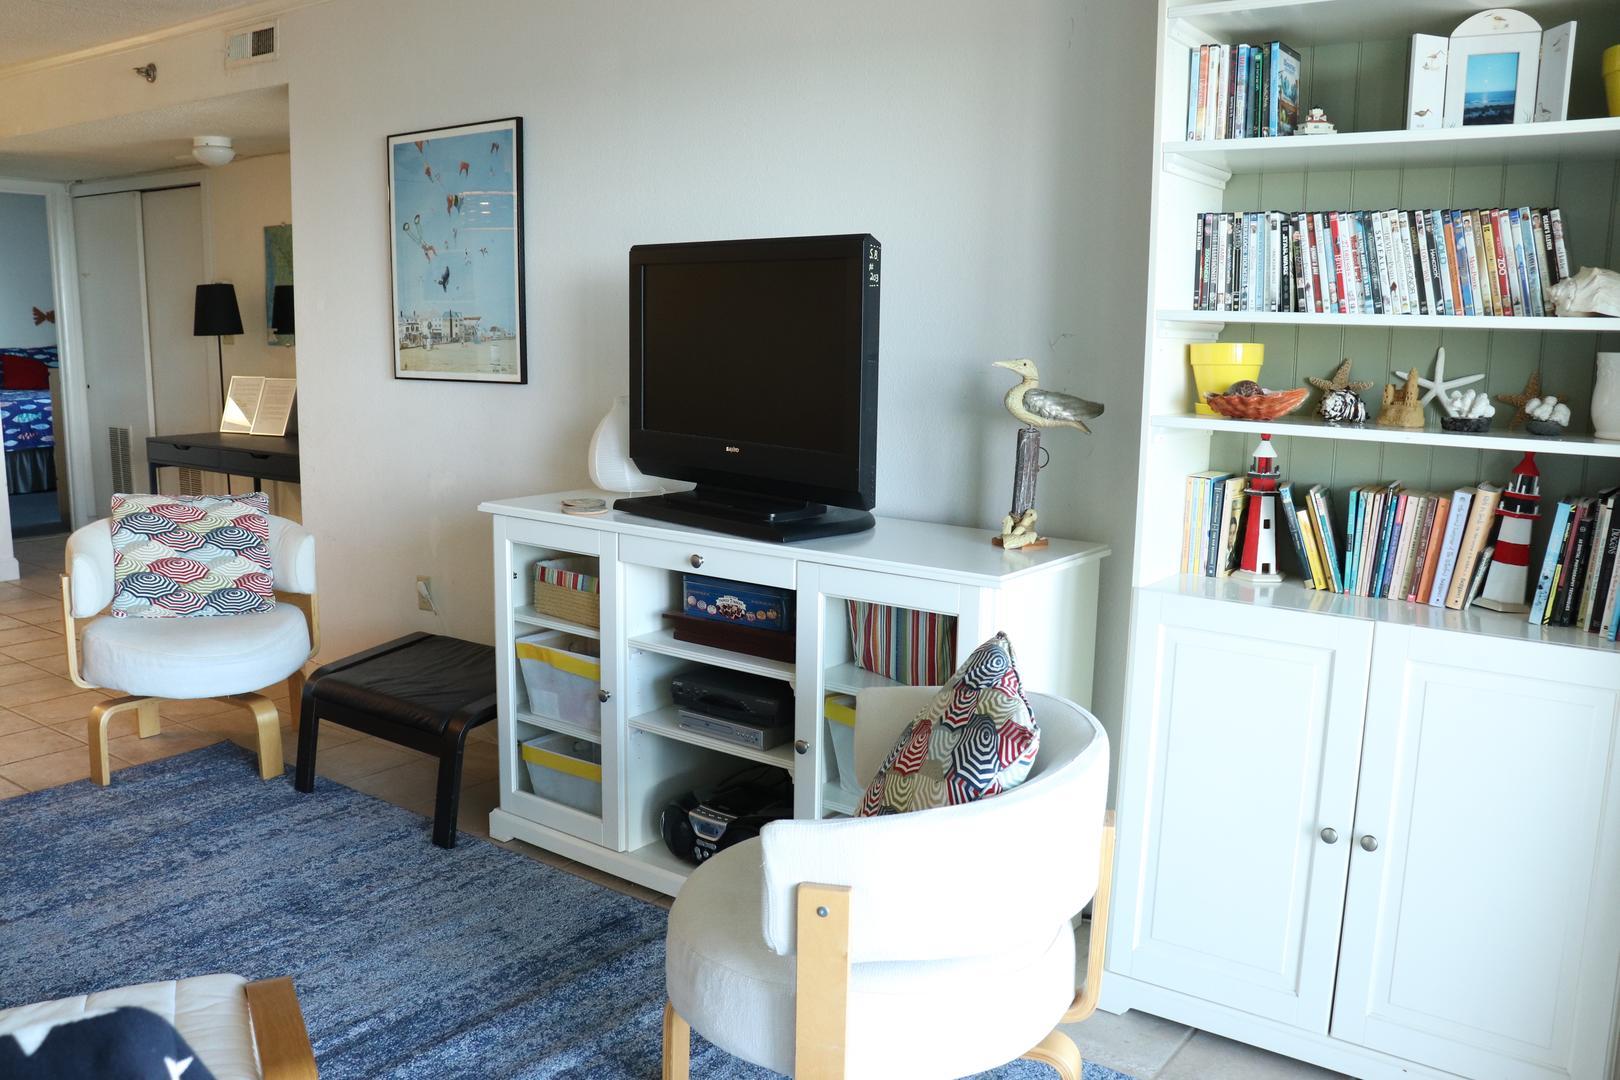 Living Room - Entertainment